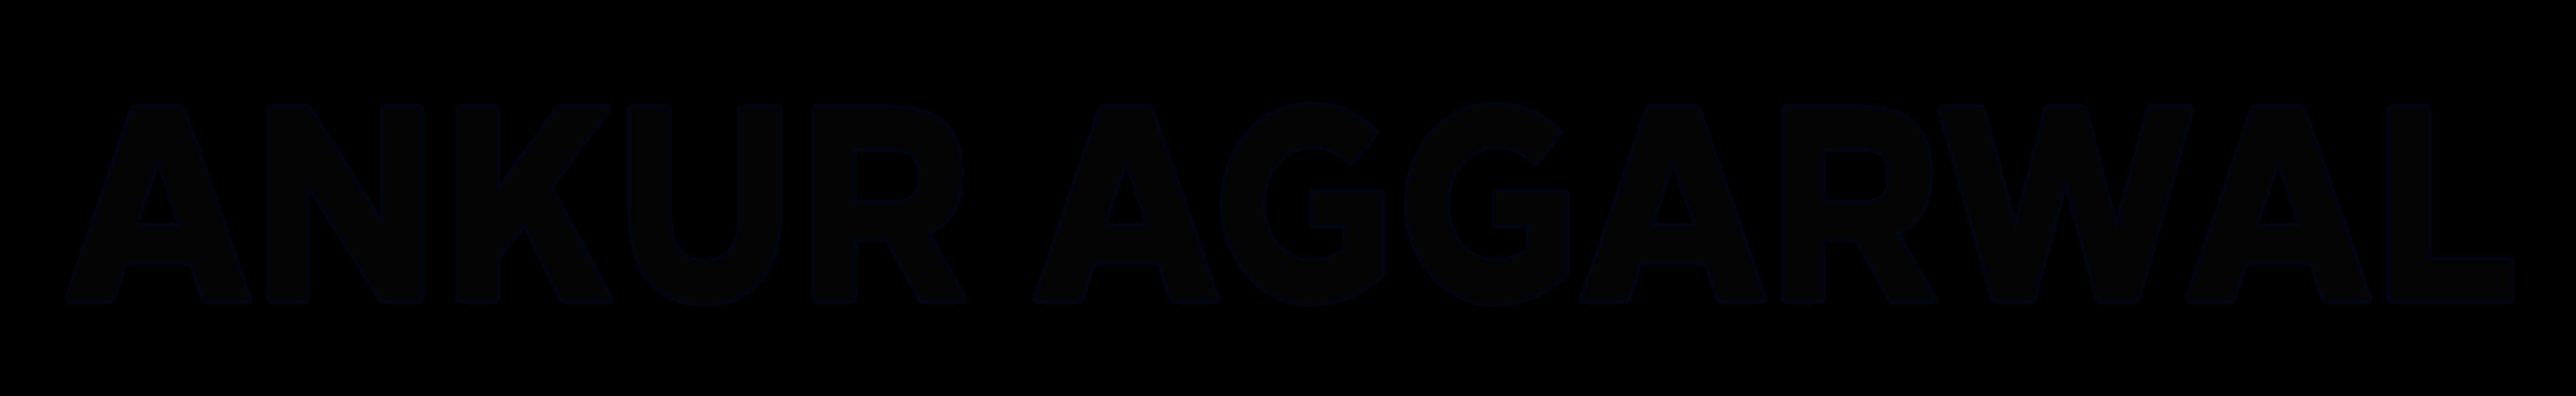 AnkurAggarwal logo